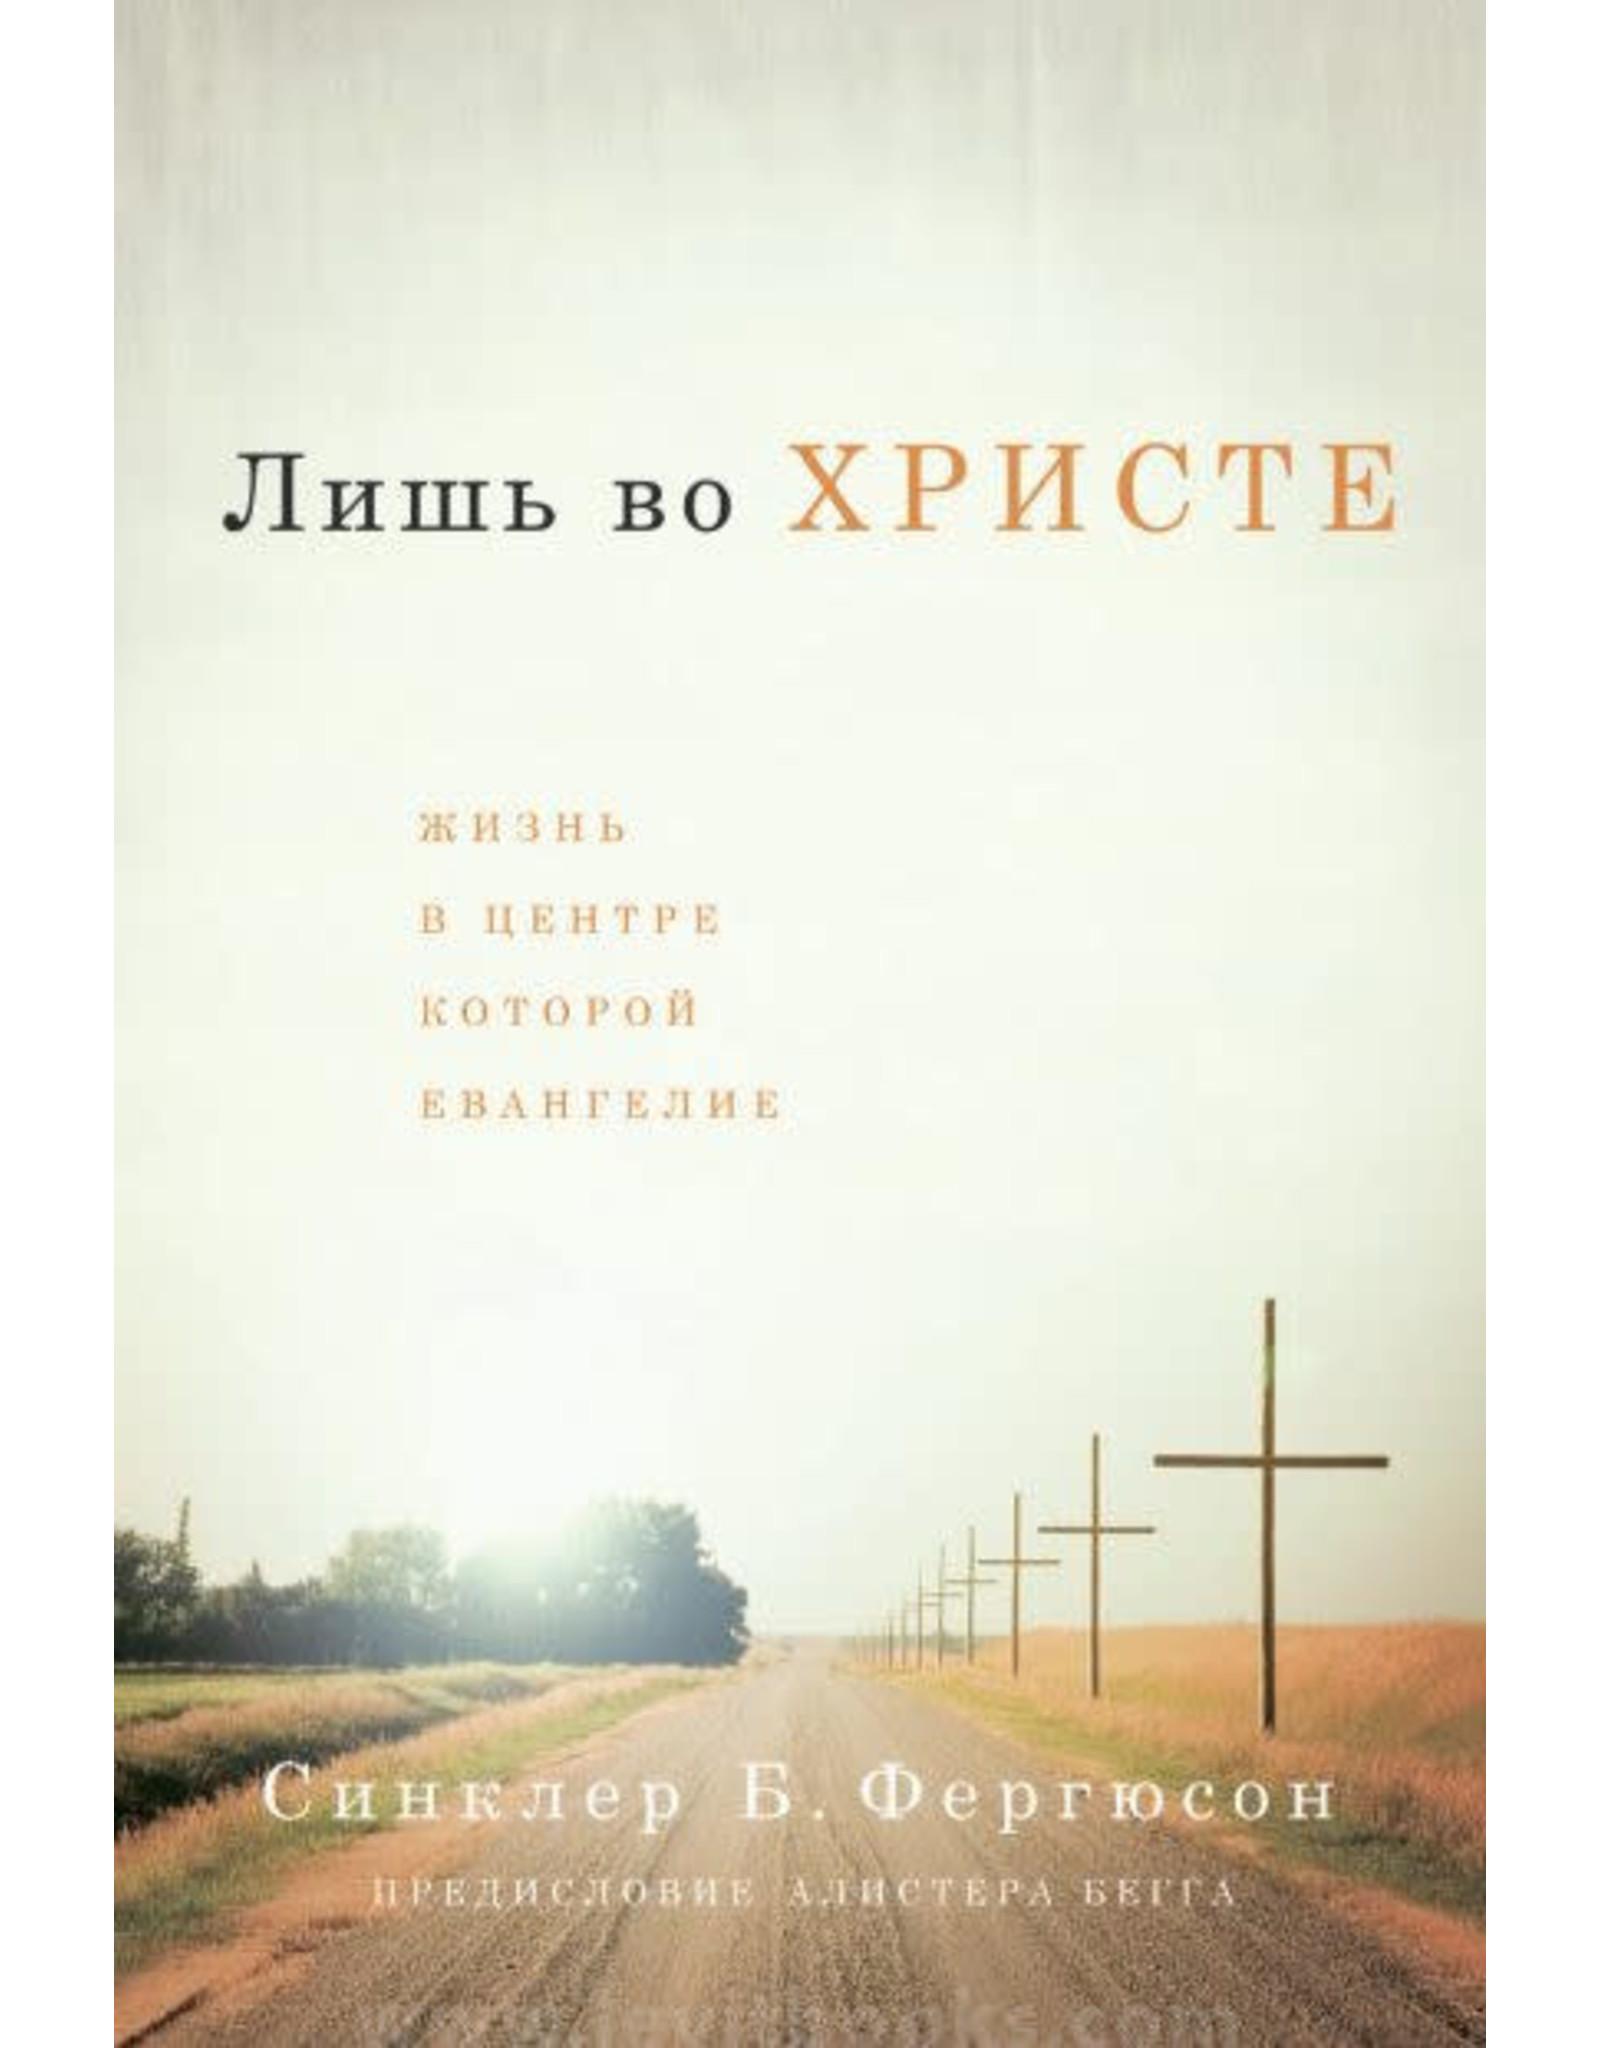 Levit Books Лишь во Христе (Only in Christ)